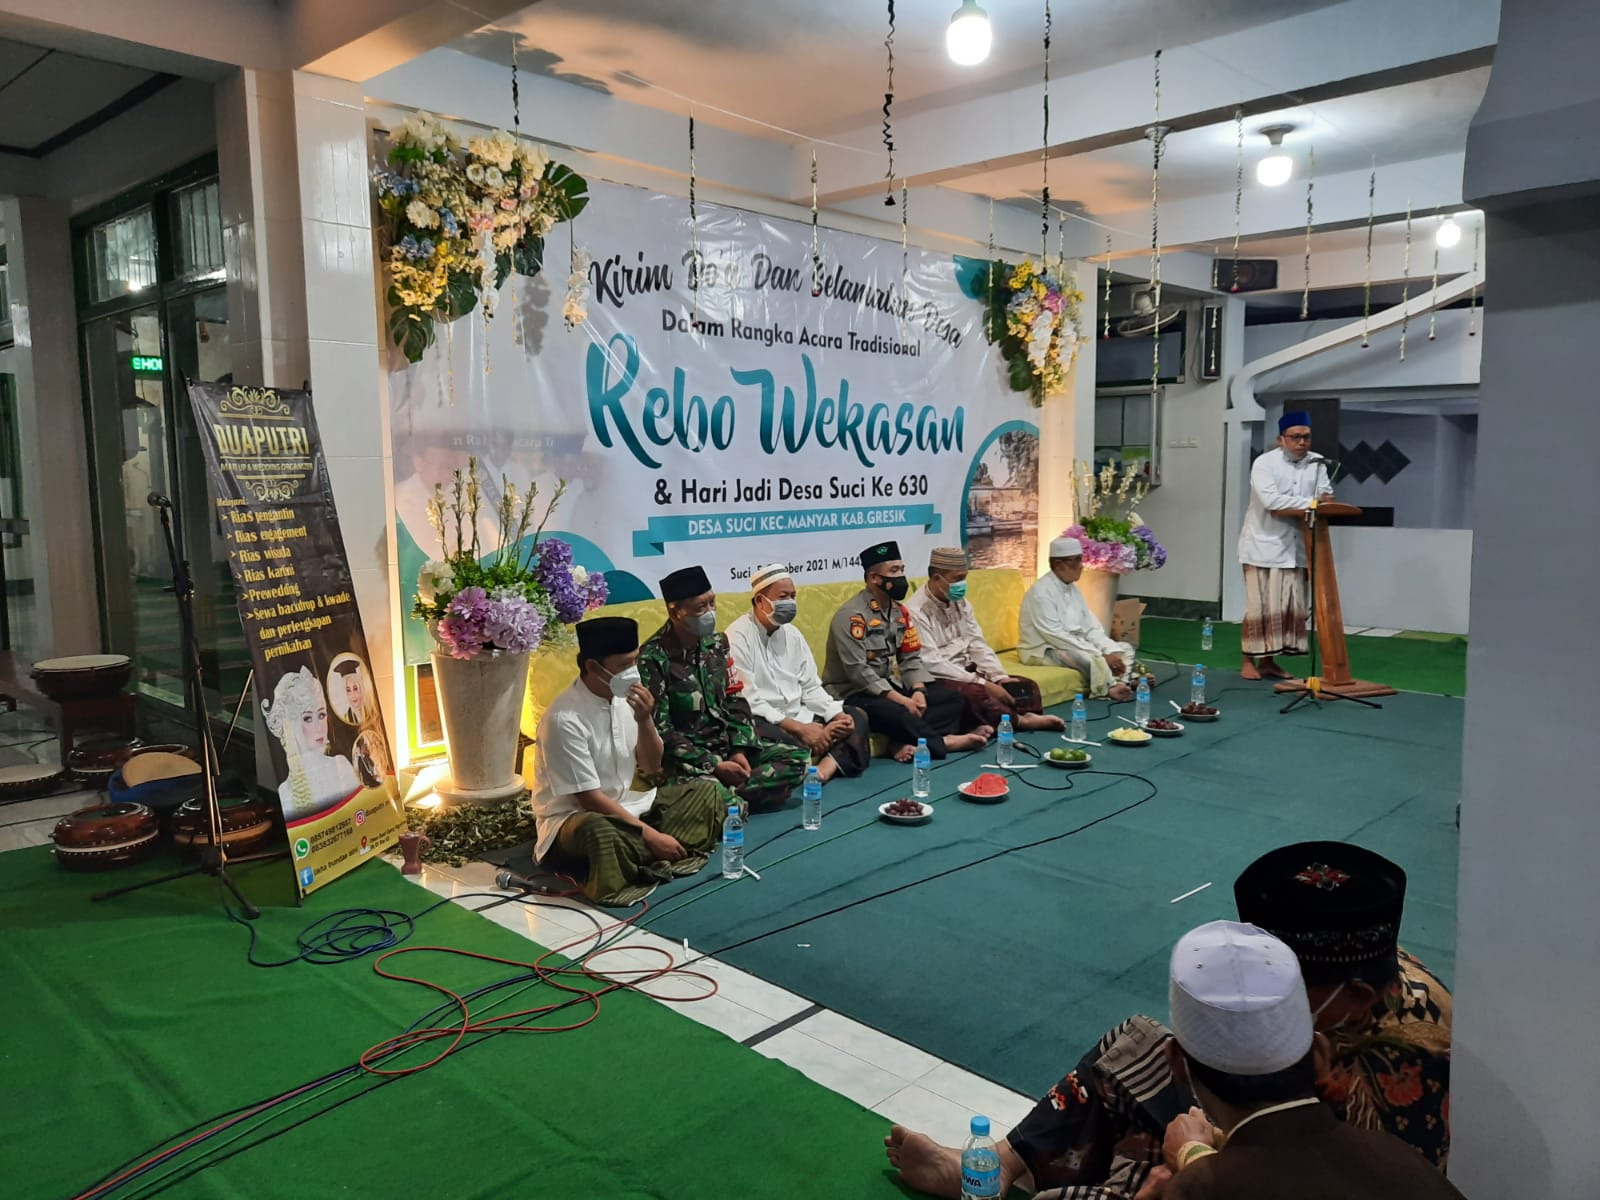 TNI POLRI Hadir Dalam Acara Tradisi Rebo Wekasan di Gresik